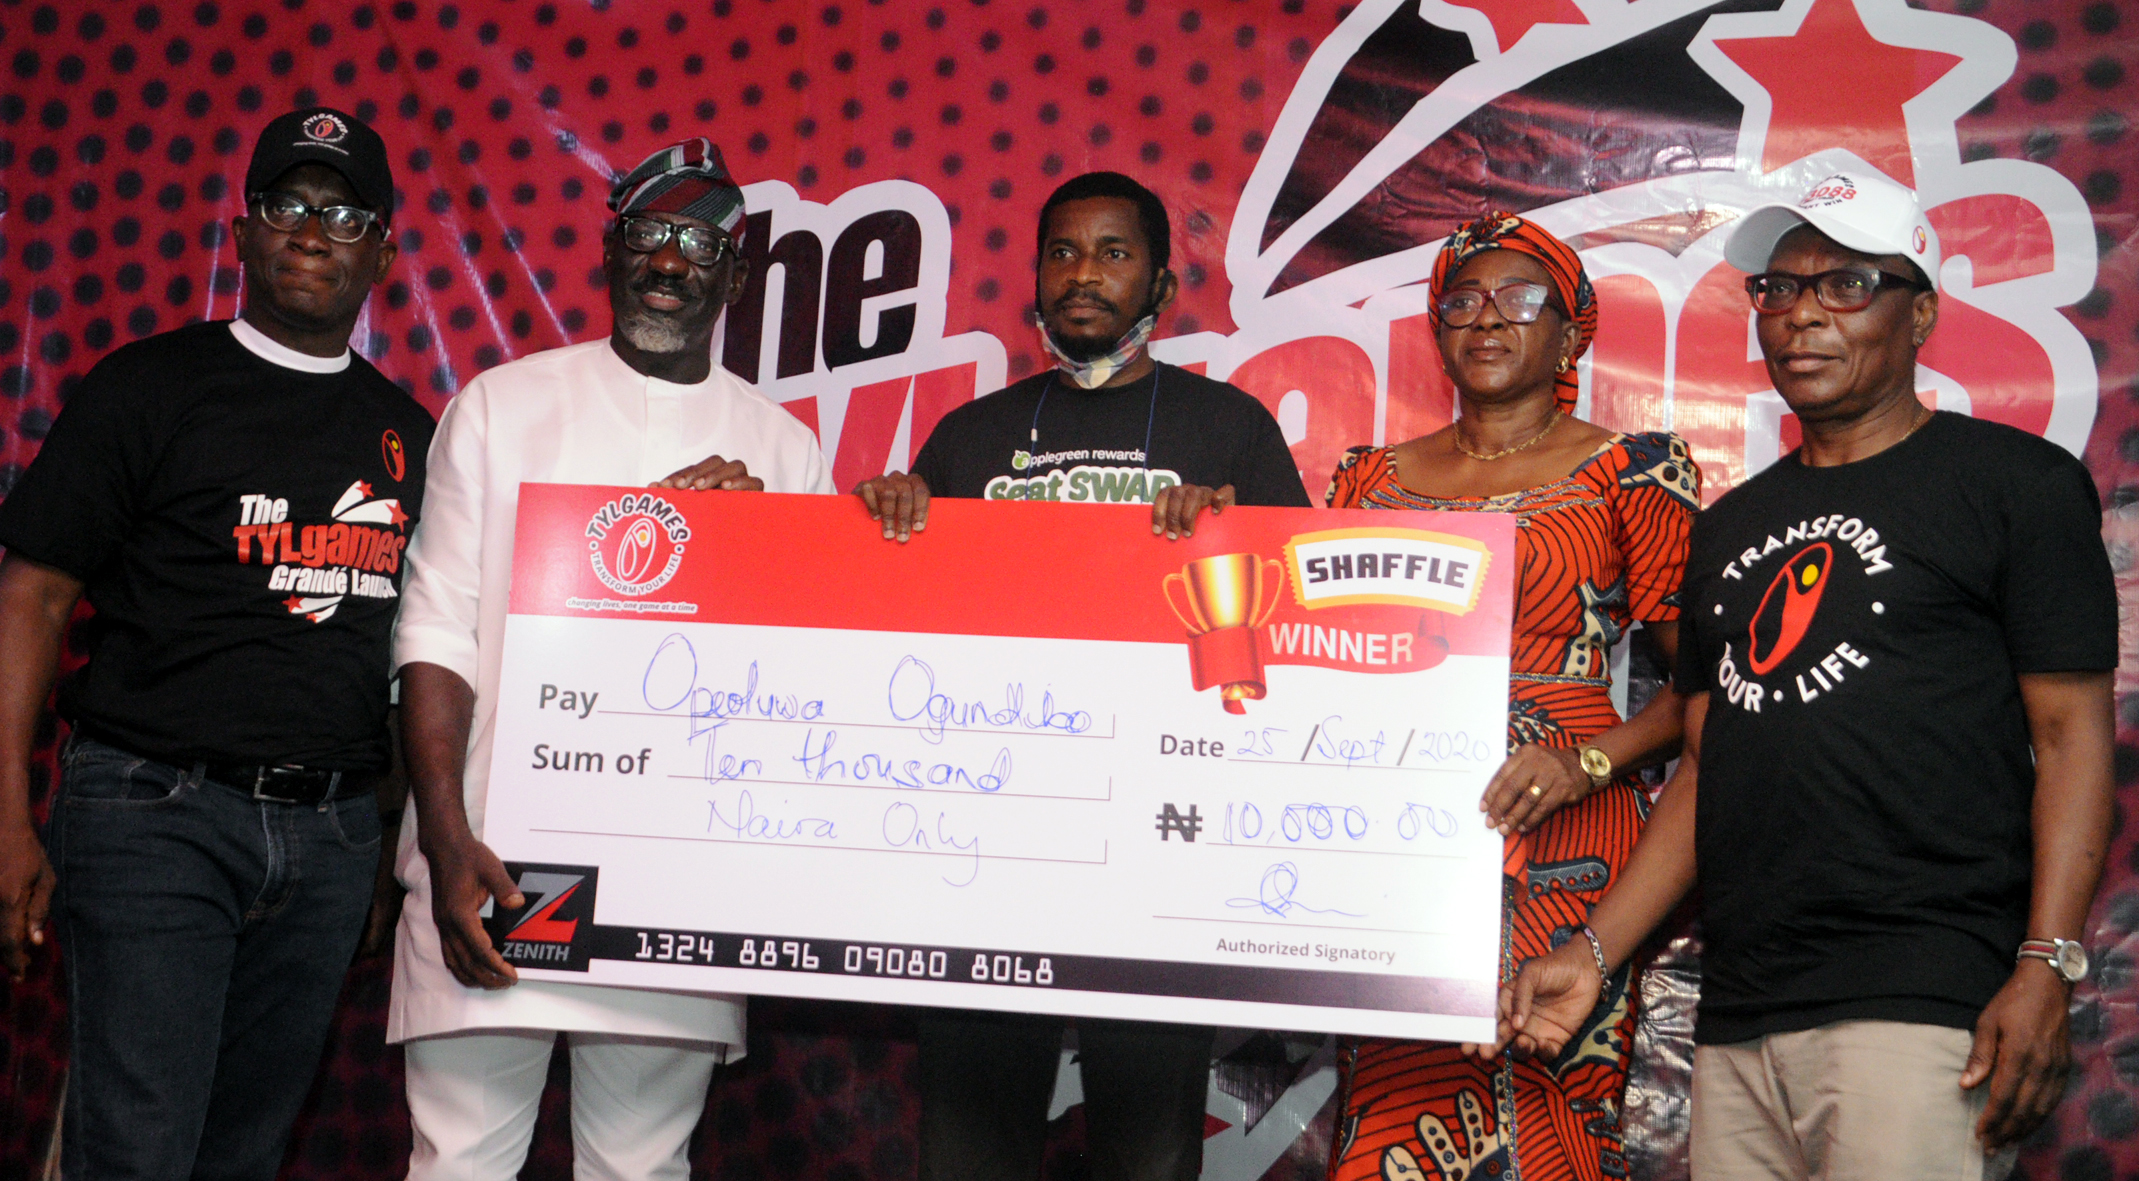 Lagos based business man wins TYLgames N1million grand prize (Photos)